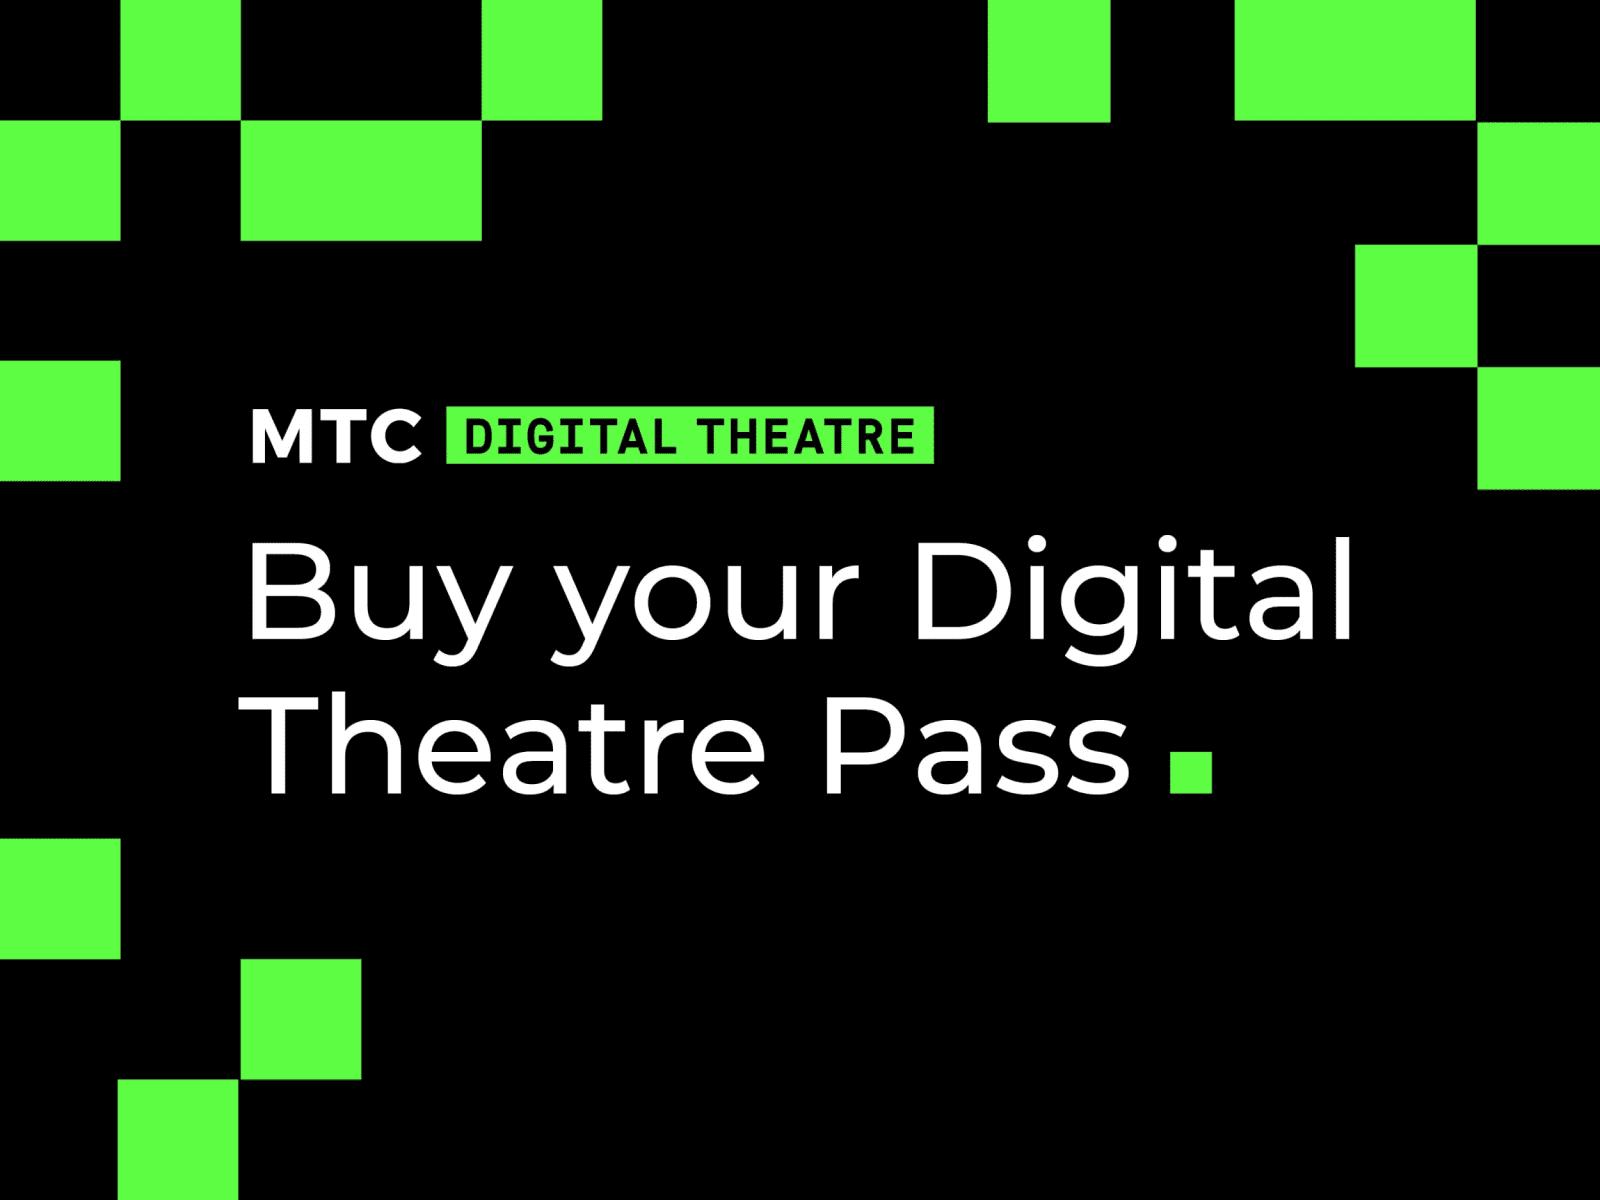 Artwork for MTC Digital Theatre Passes